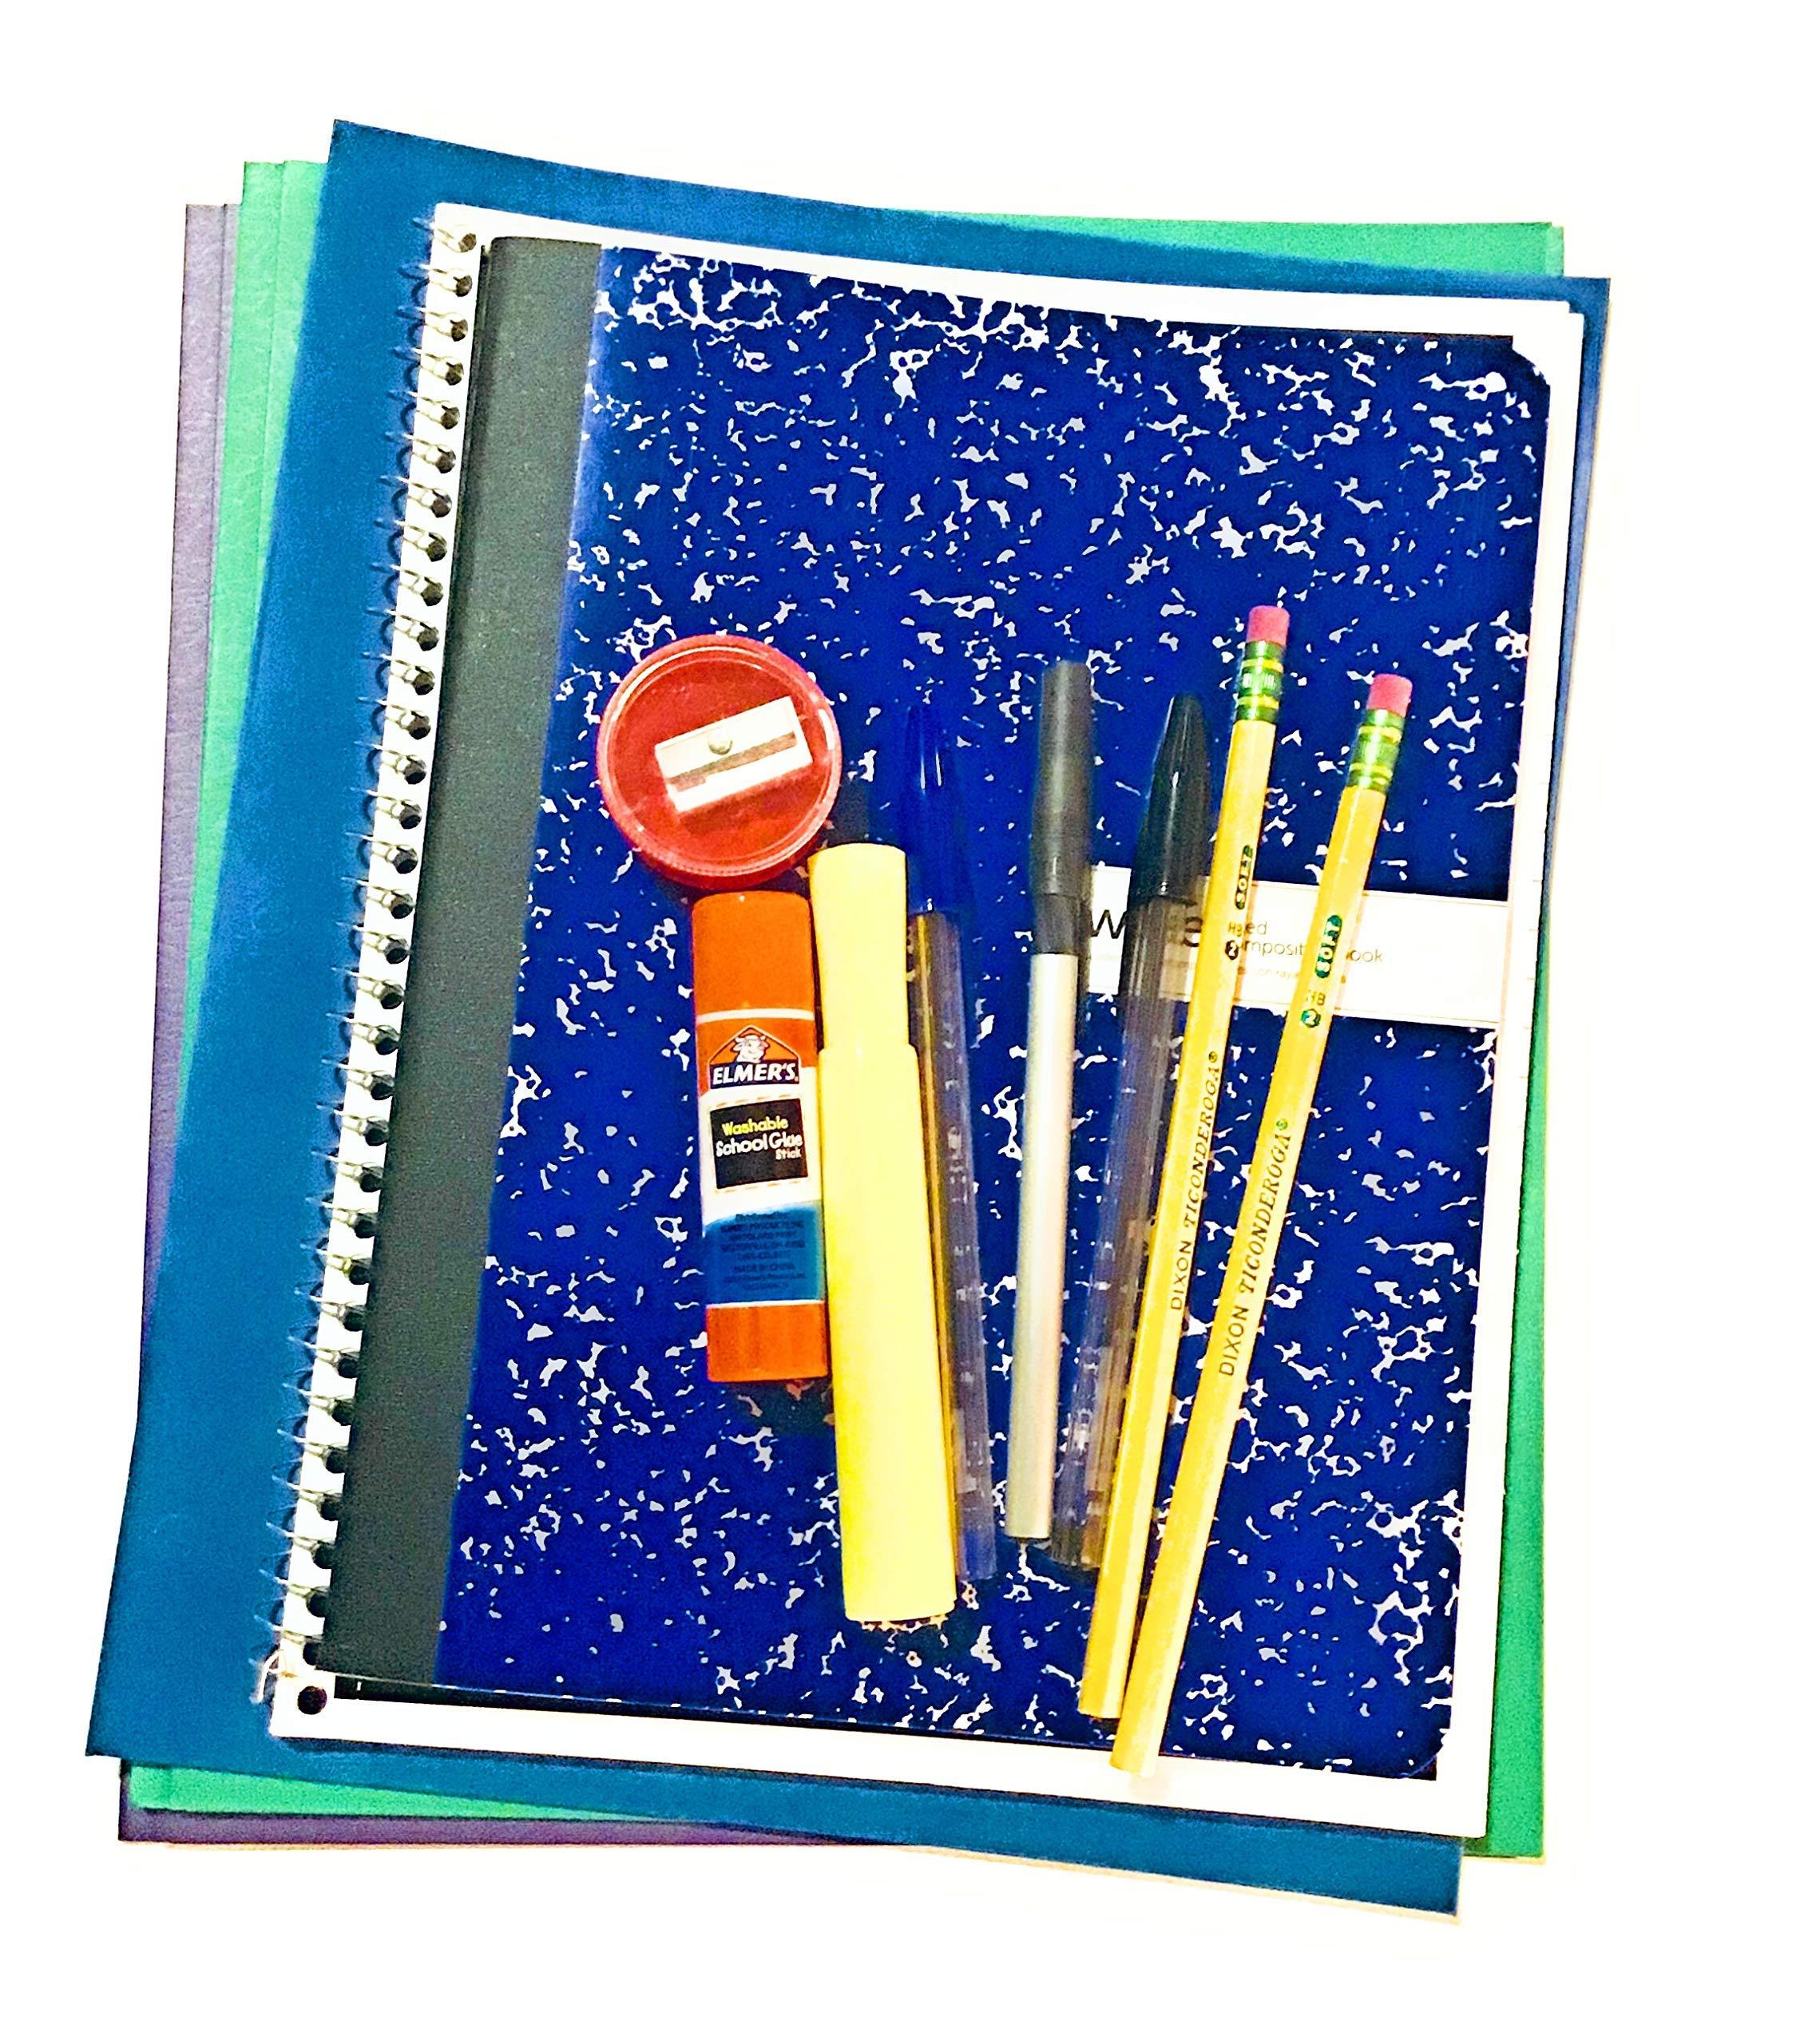 13 Piece School Supply,Notebook,Composition,folders Bundles Grades 6-12